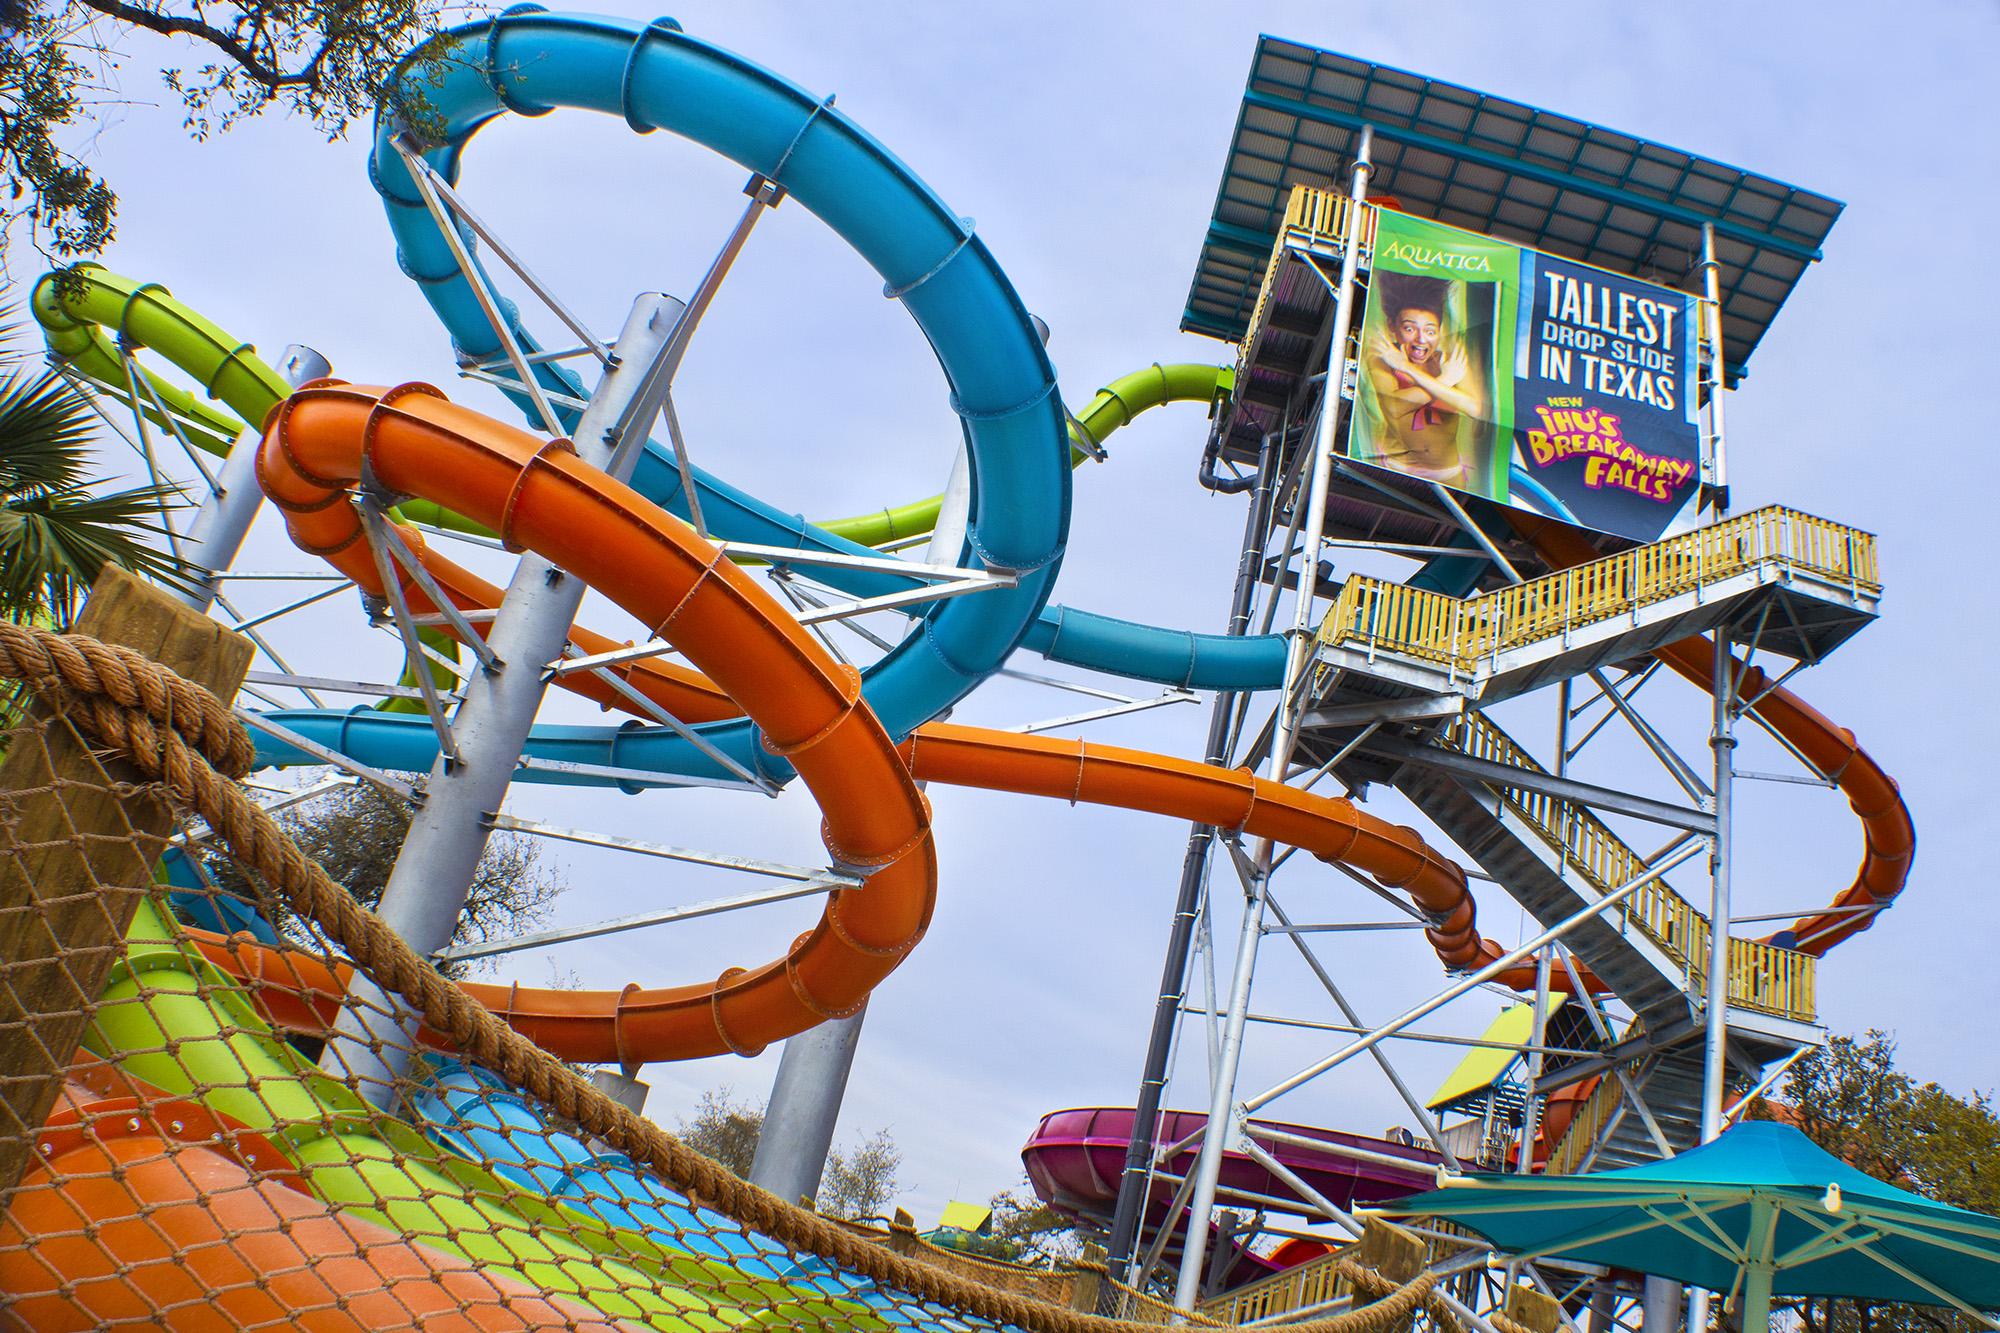 New San Antonio Rides Attractions At Sea World And Six